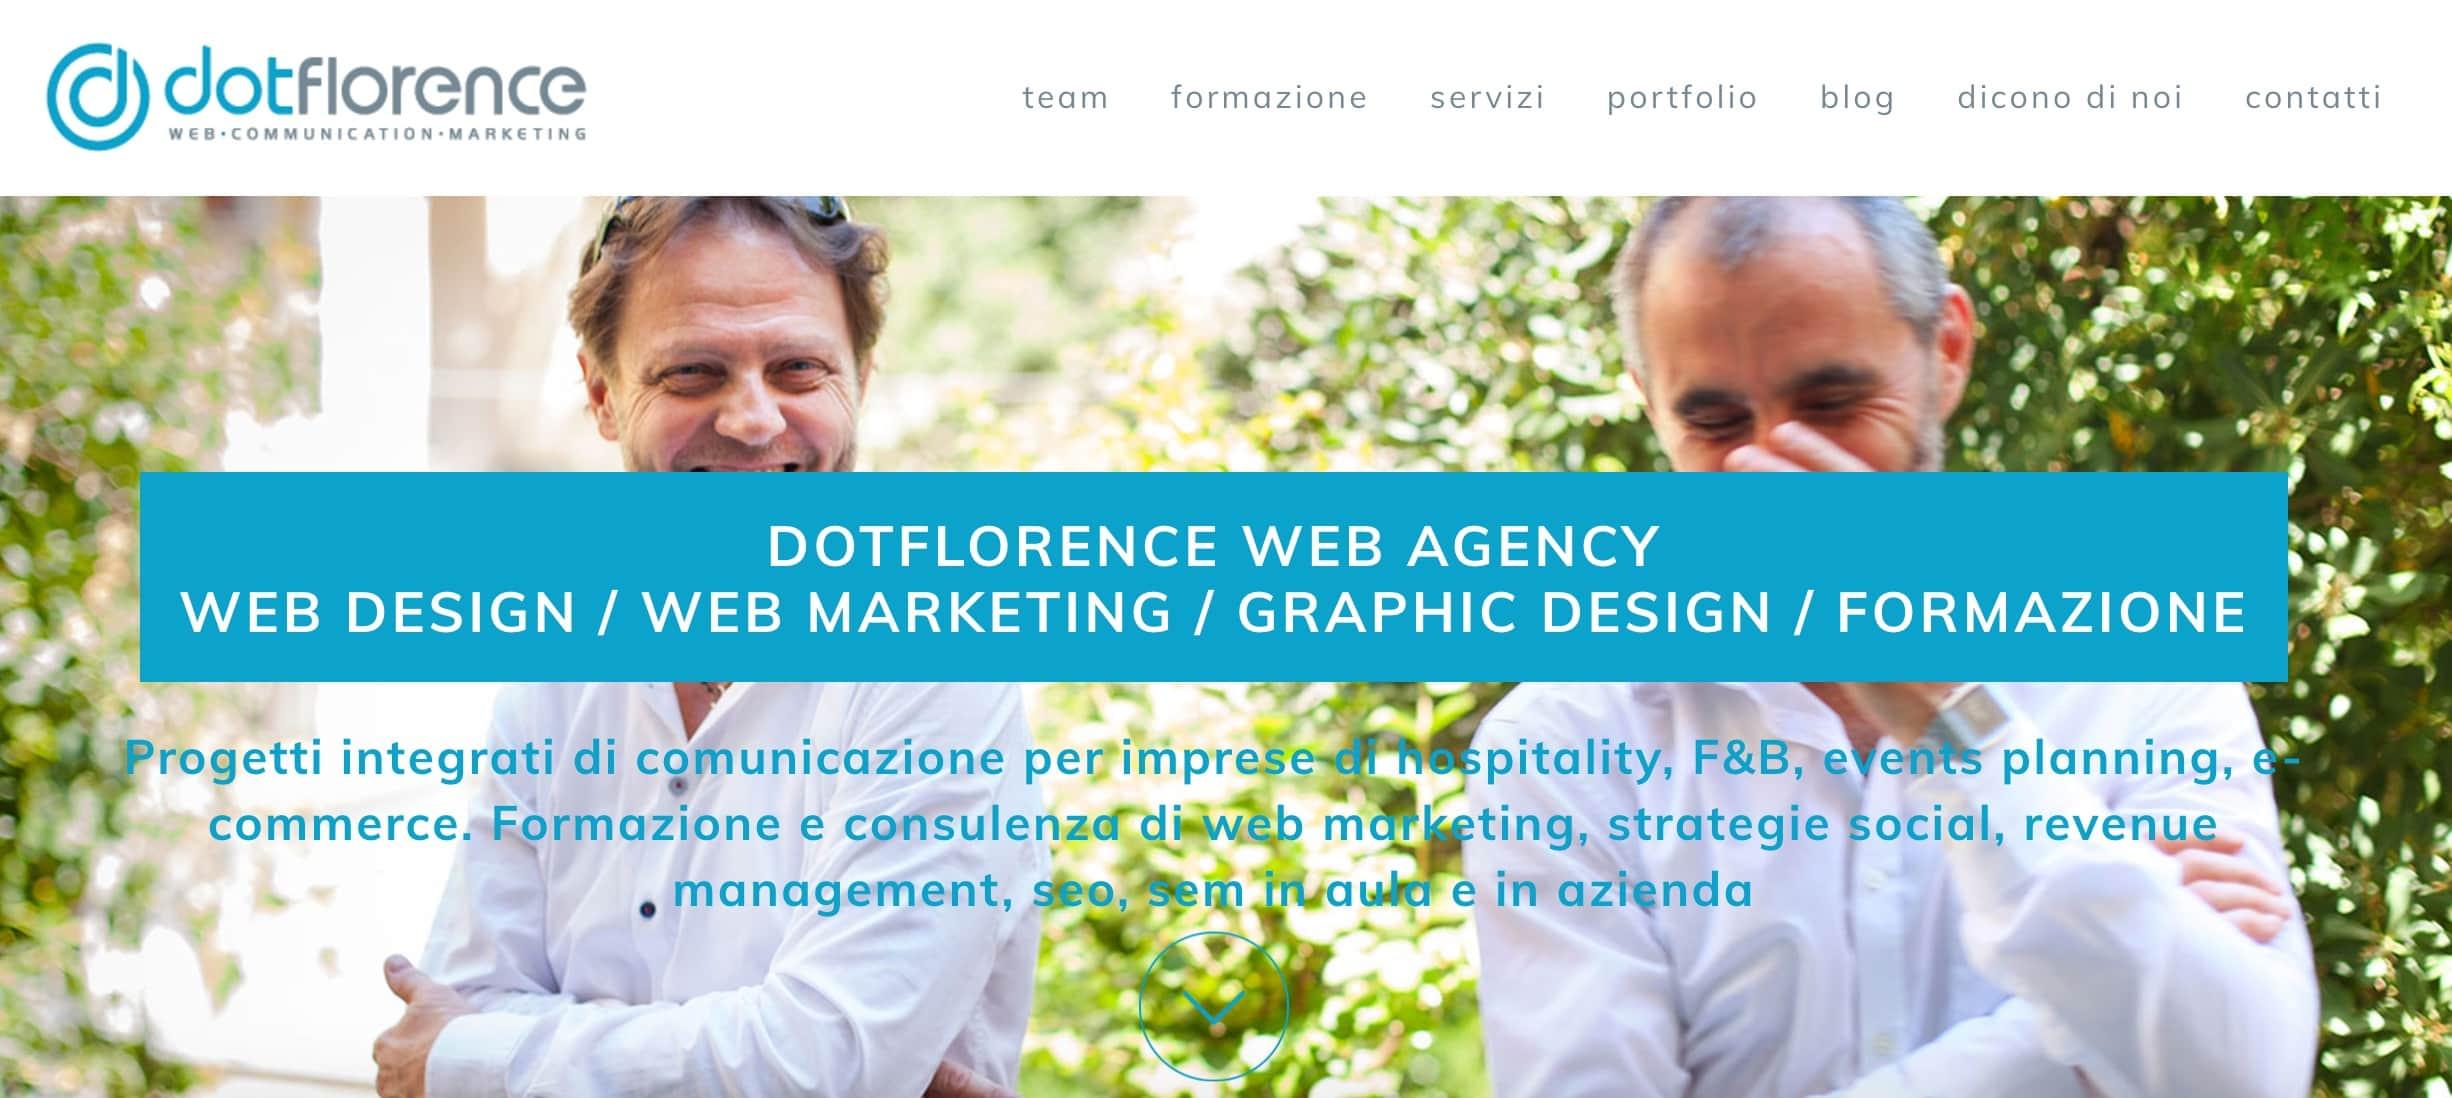 home-page-dotflorence